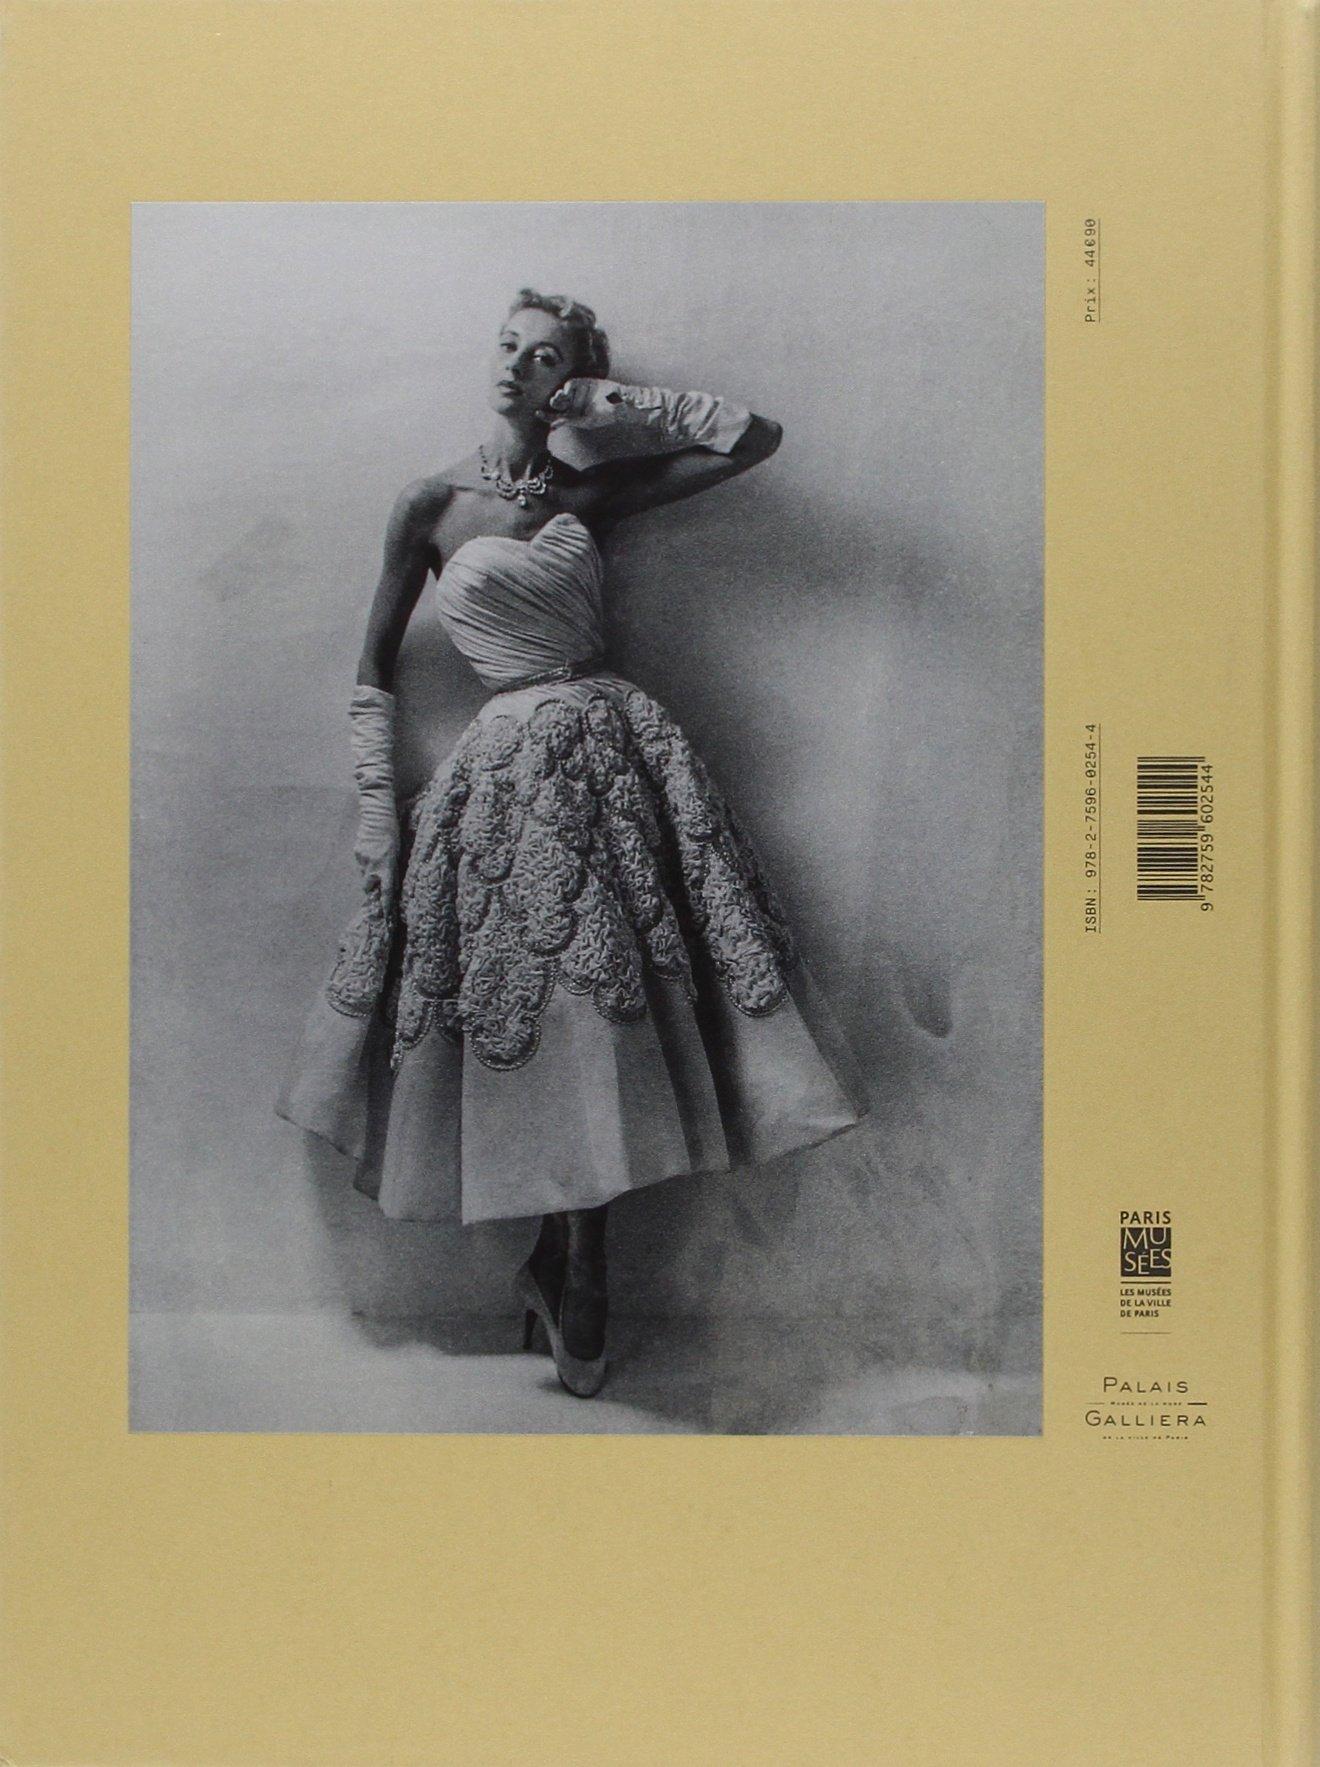 99b763014191e Les années 50   La mode en France 1947-1957  Amazon.co.uk  Alexandra Bosc,  Olivier Saillard, Ykje Wildenborg, Jacqueline Dumaine, Collectif  Books